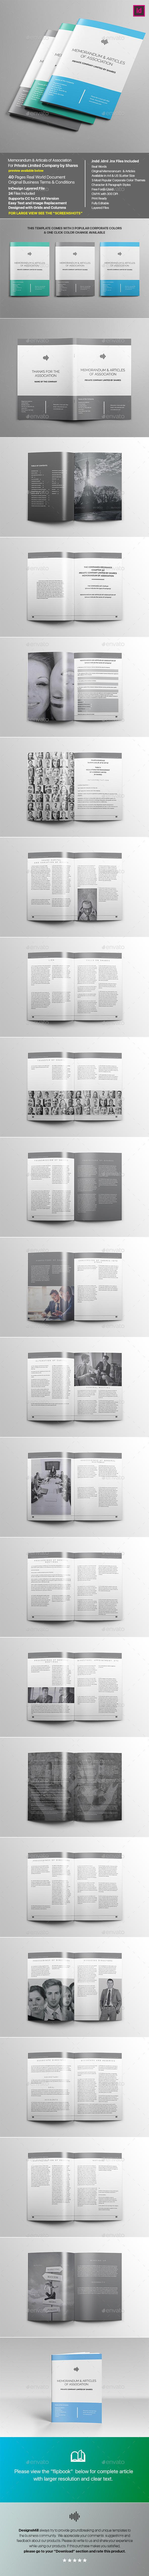 Business Setup Proposal - Miscellaneous Print Templates